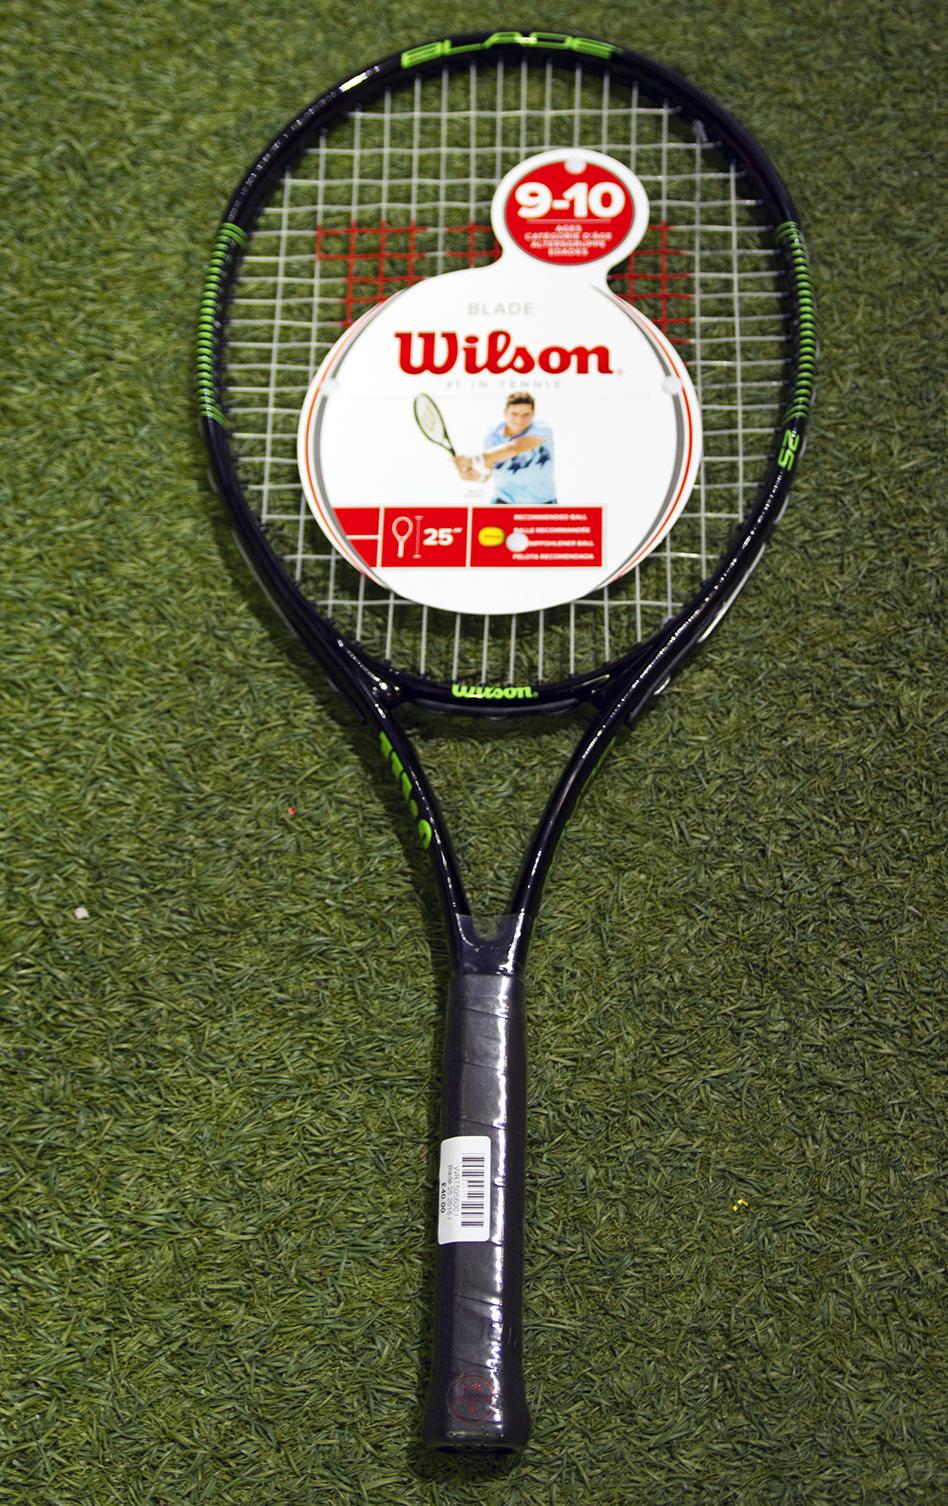 New in: Wilson Blade 2015 range